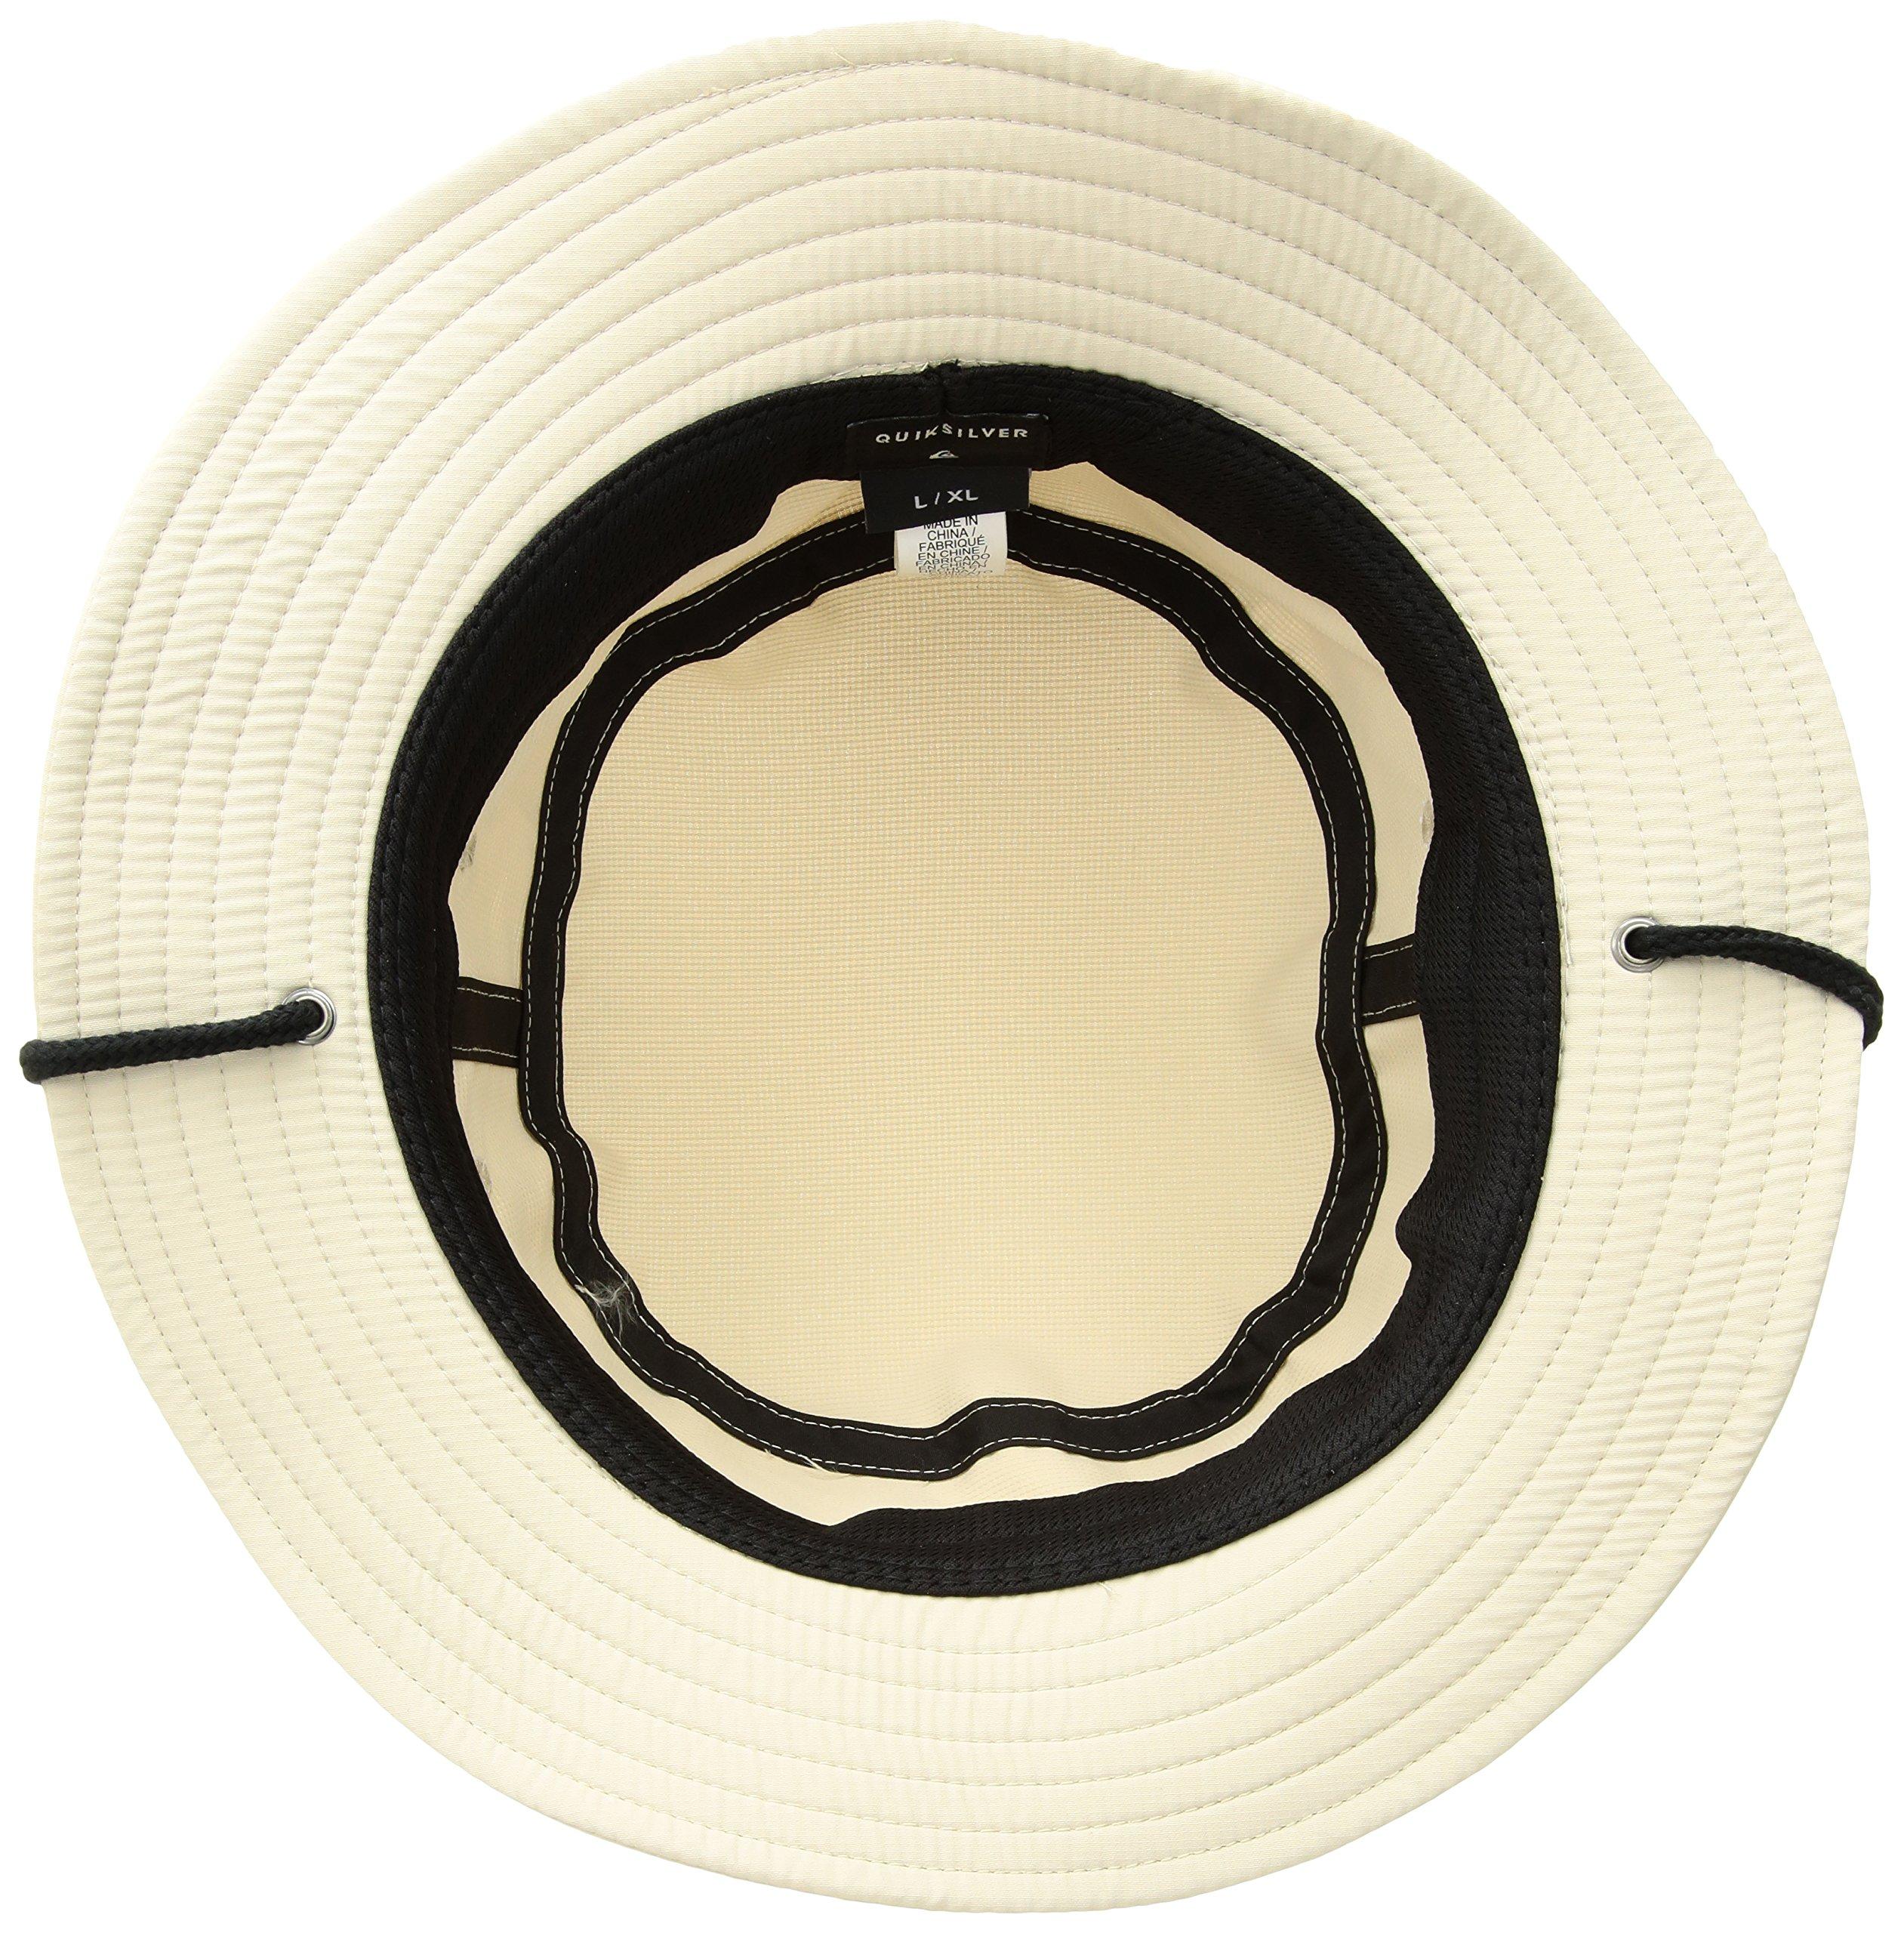 a59b9f918c177 Quiksilver Bushmaster Light - Bucket Spring Summer Sun Hat with Chin  Strap(S-XL)